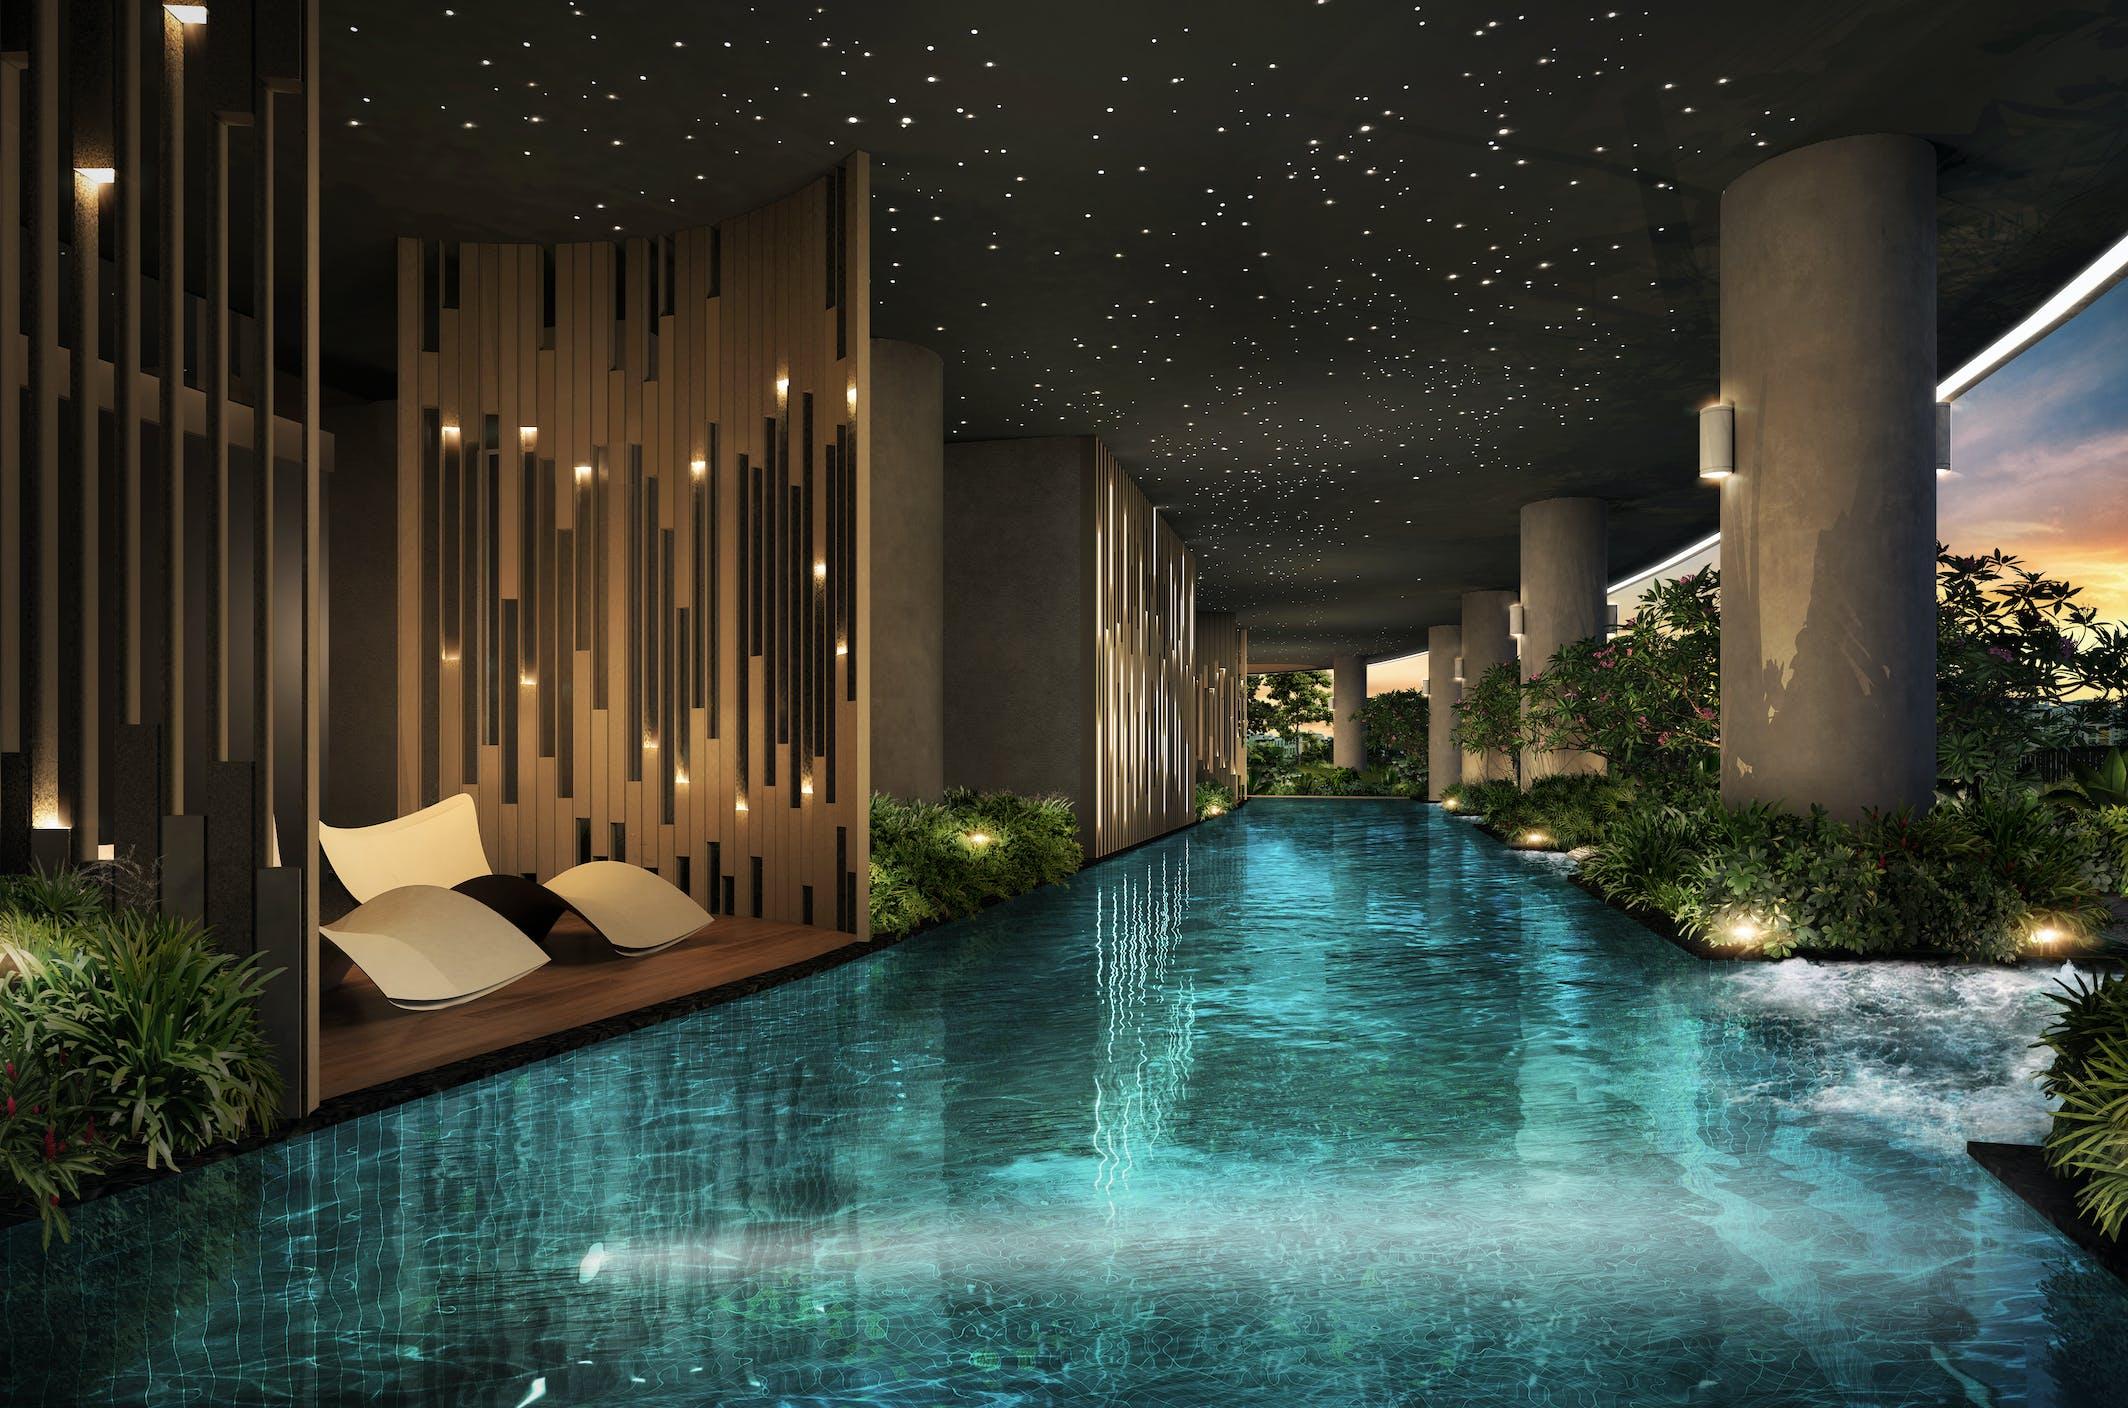 Stunning pool view